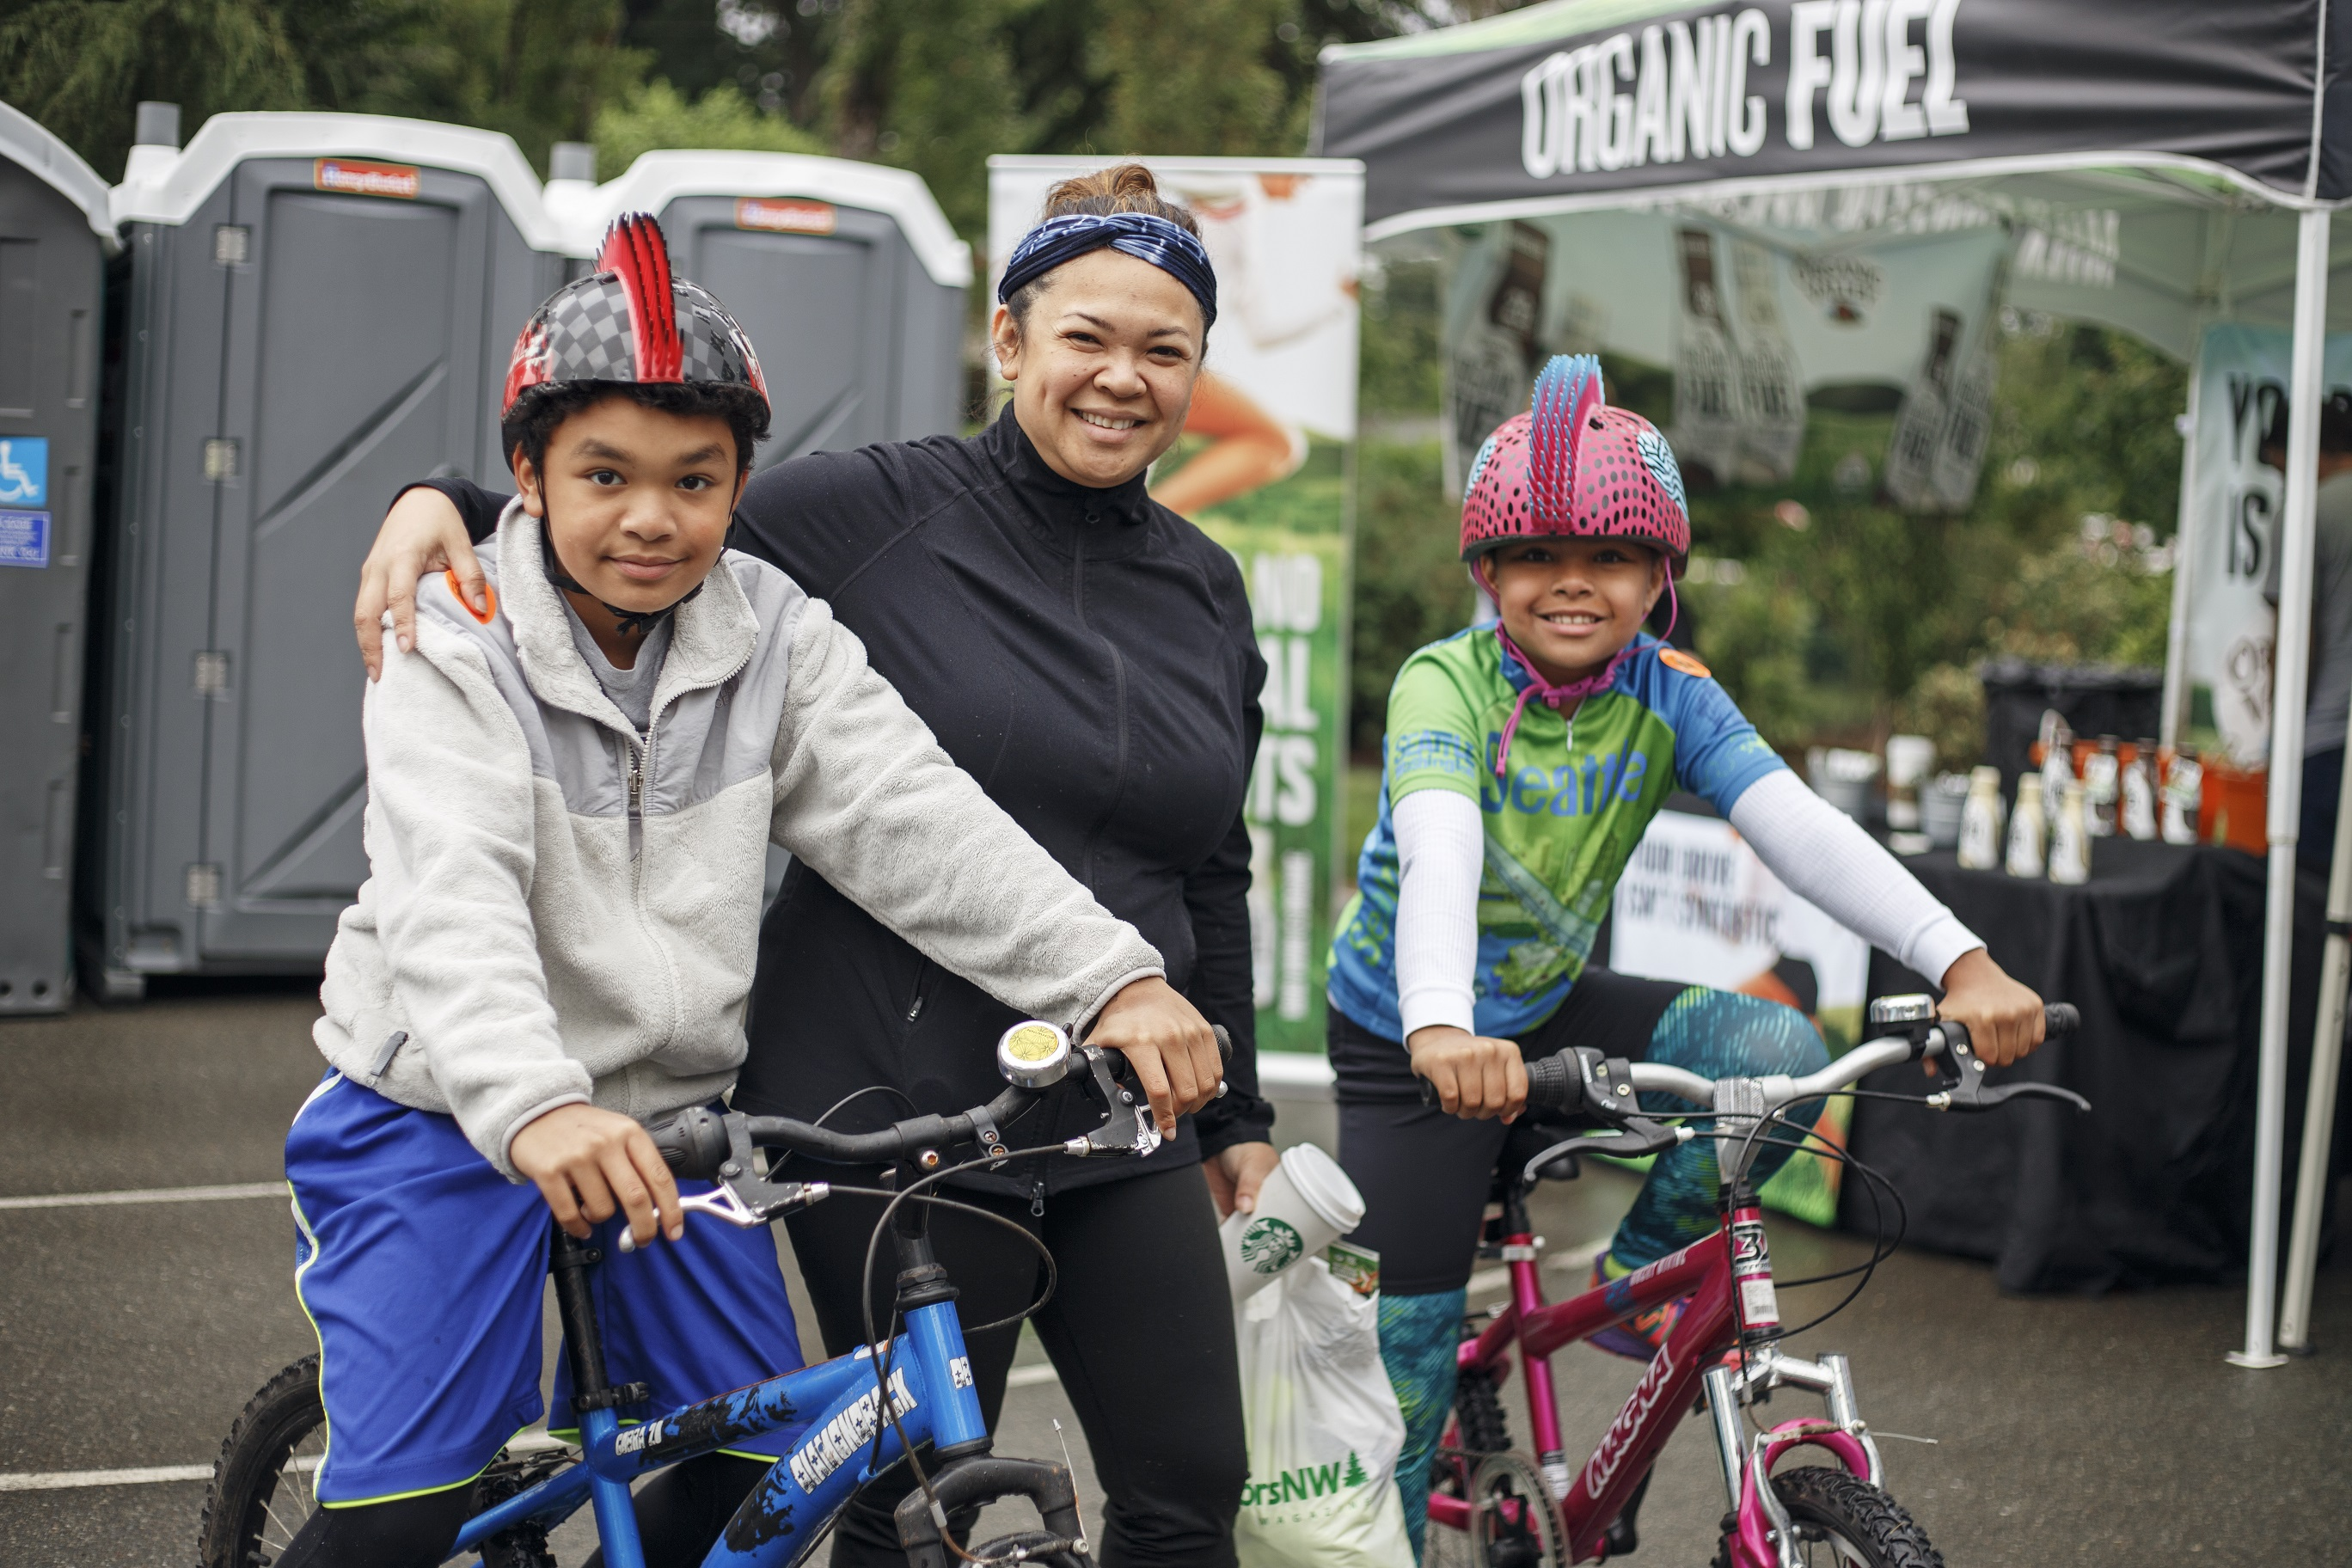 6th Annual Lake to Lake Bike Ride in Bellevue June 3, 2017